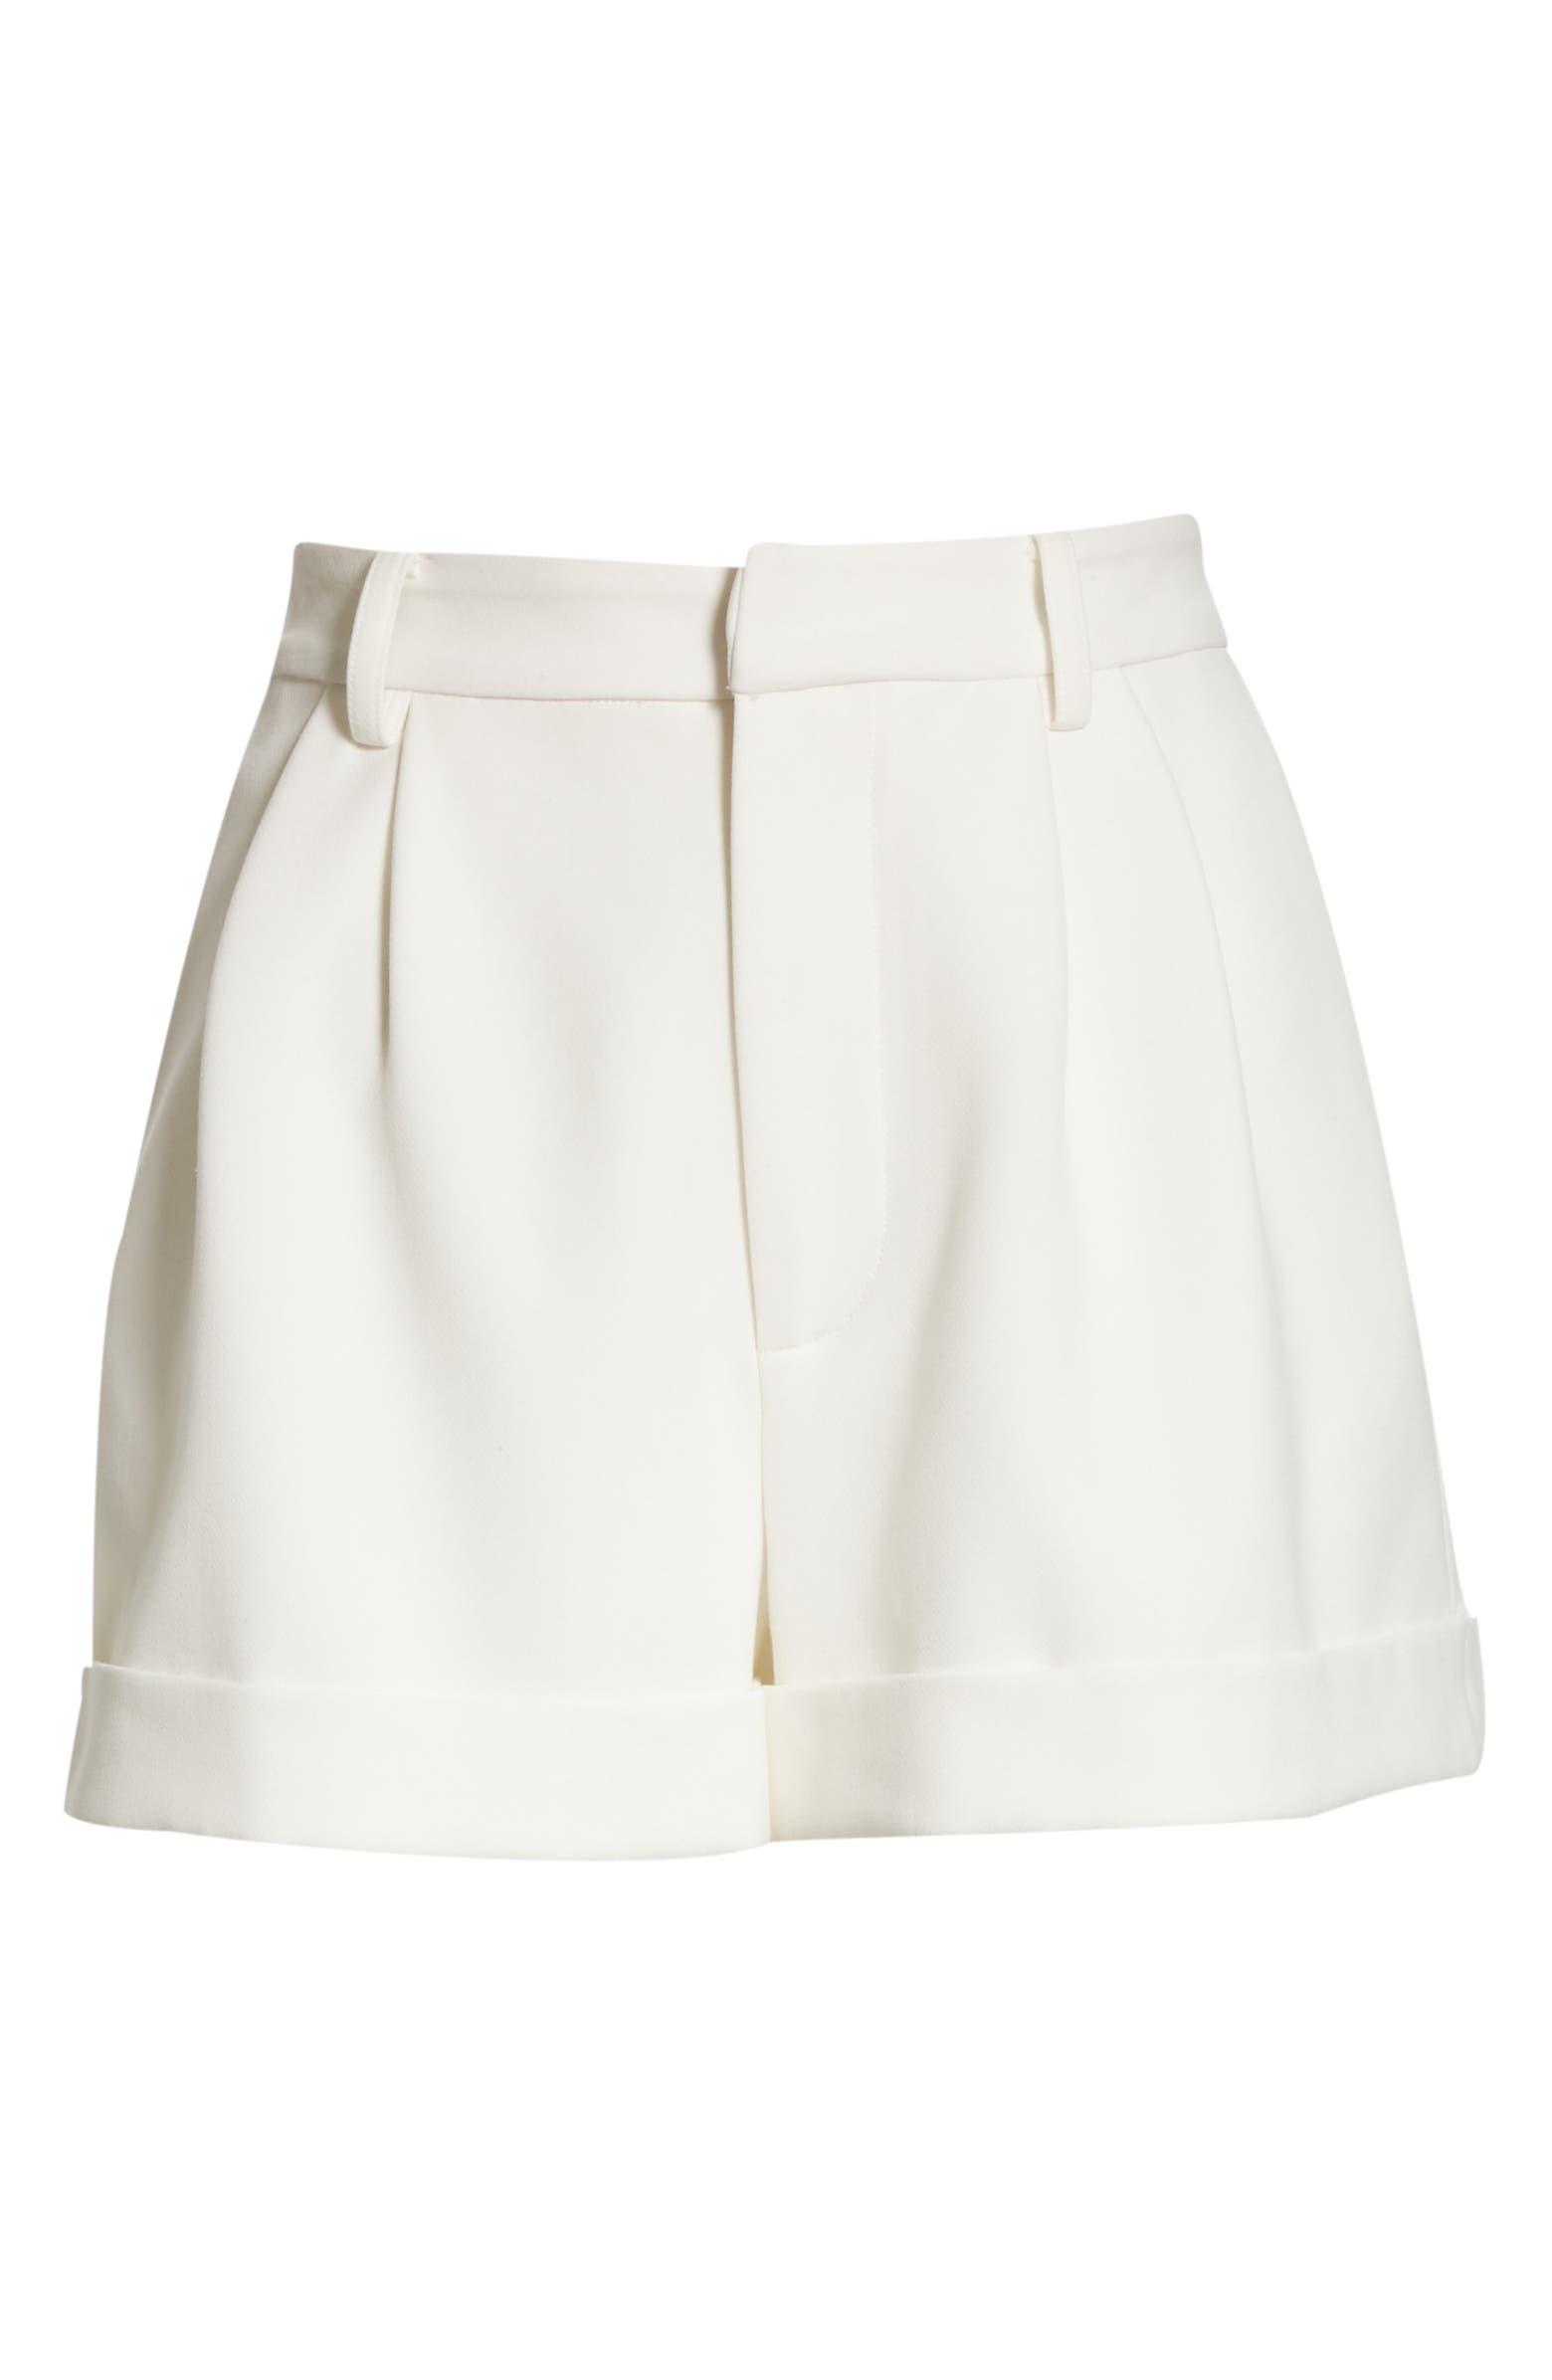 Conry Pleated Cuff Shorts ALICE + OLIVIA